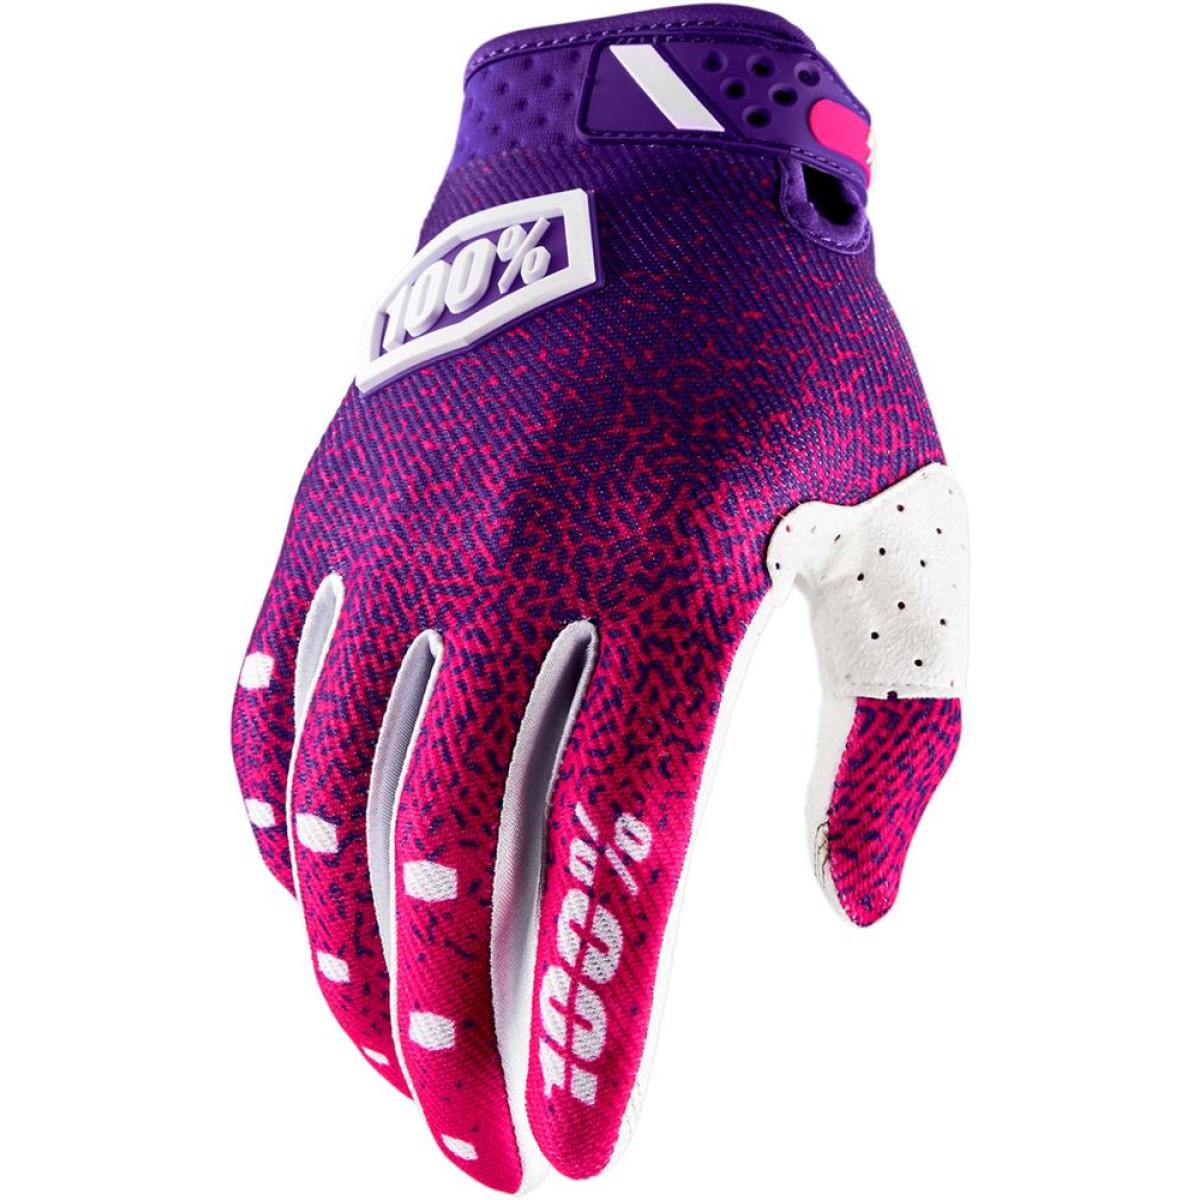 Motokrosové rukavice 100% RIDEFIT Pink Purple vel. S  bdcaa778db